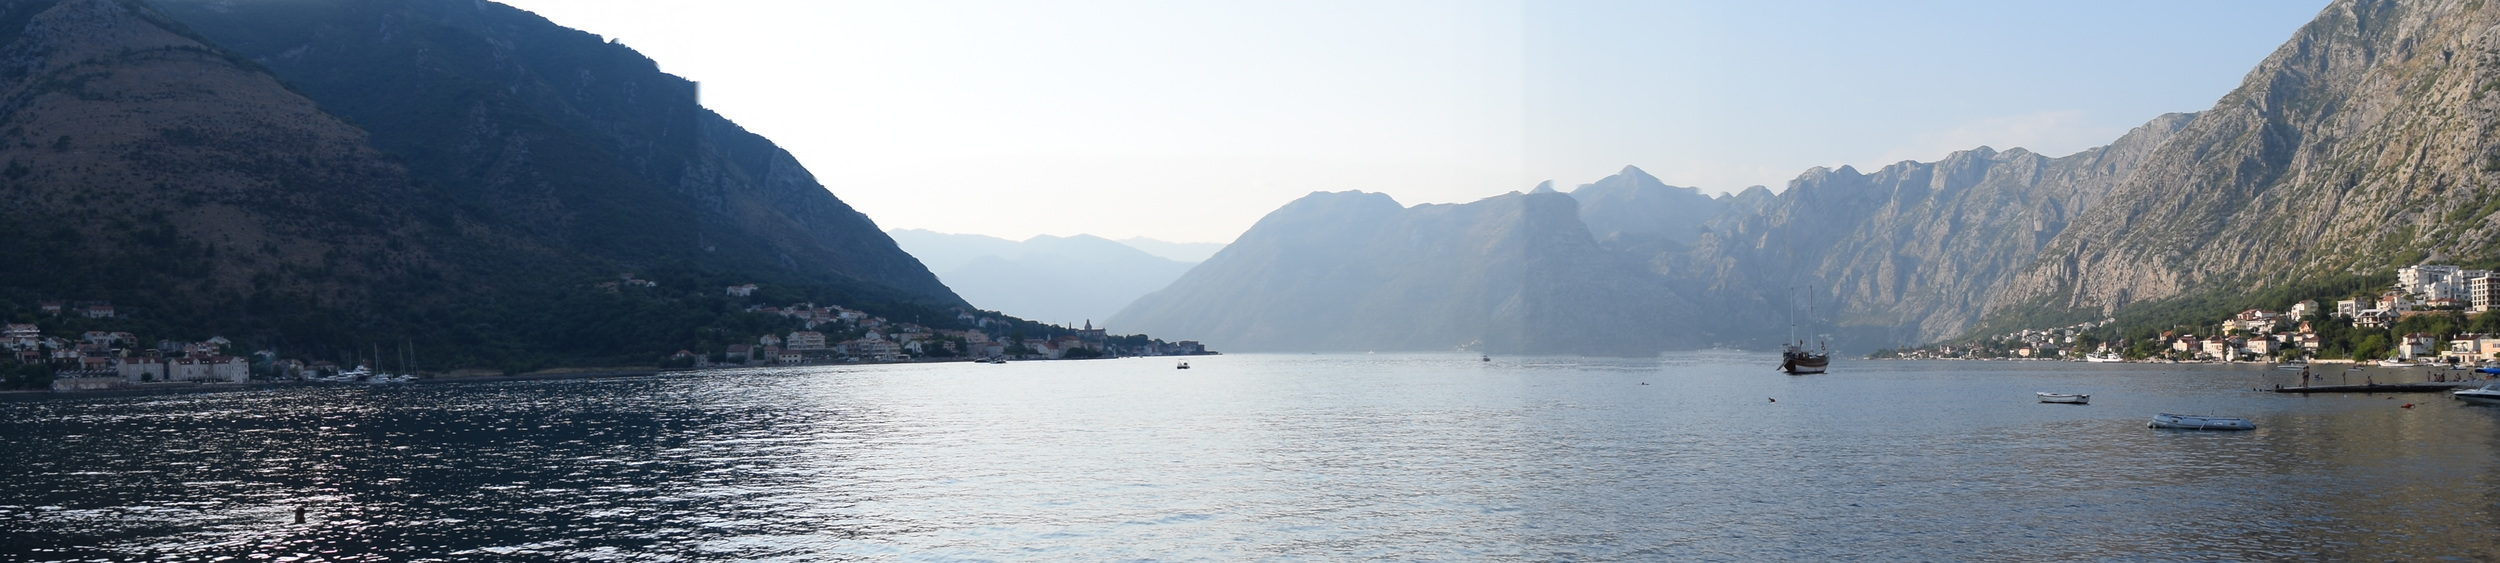 Panorama of the Bay of Kotor